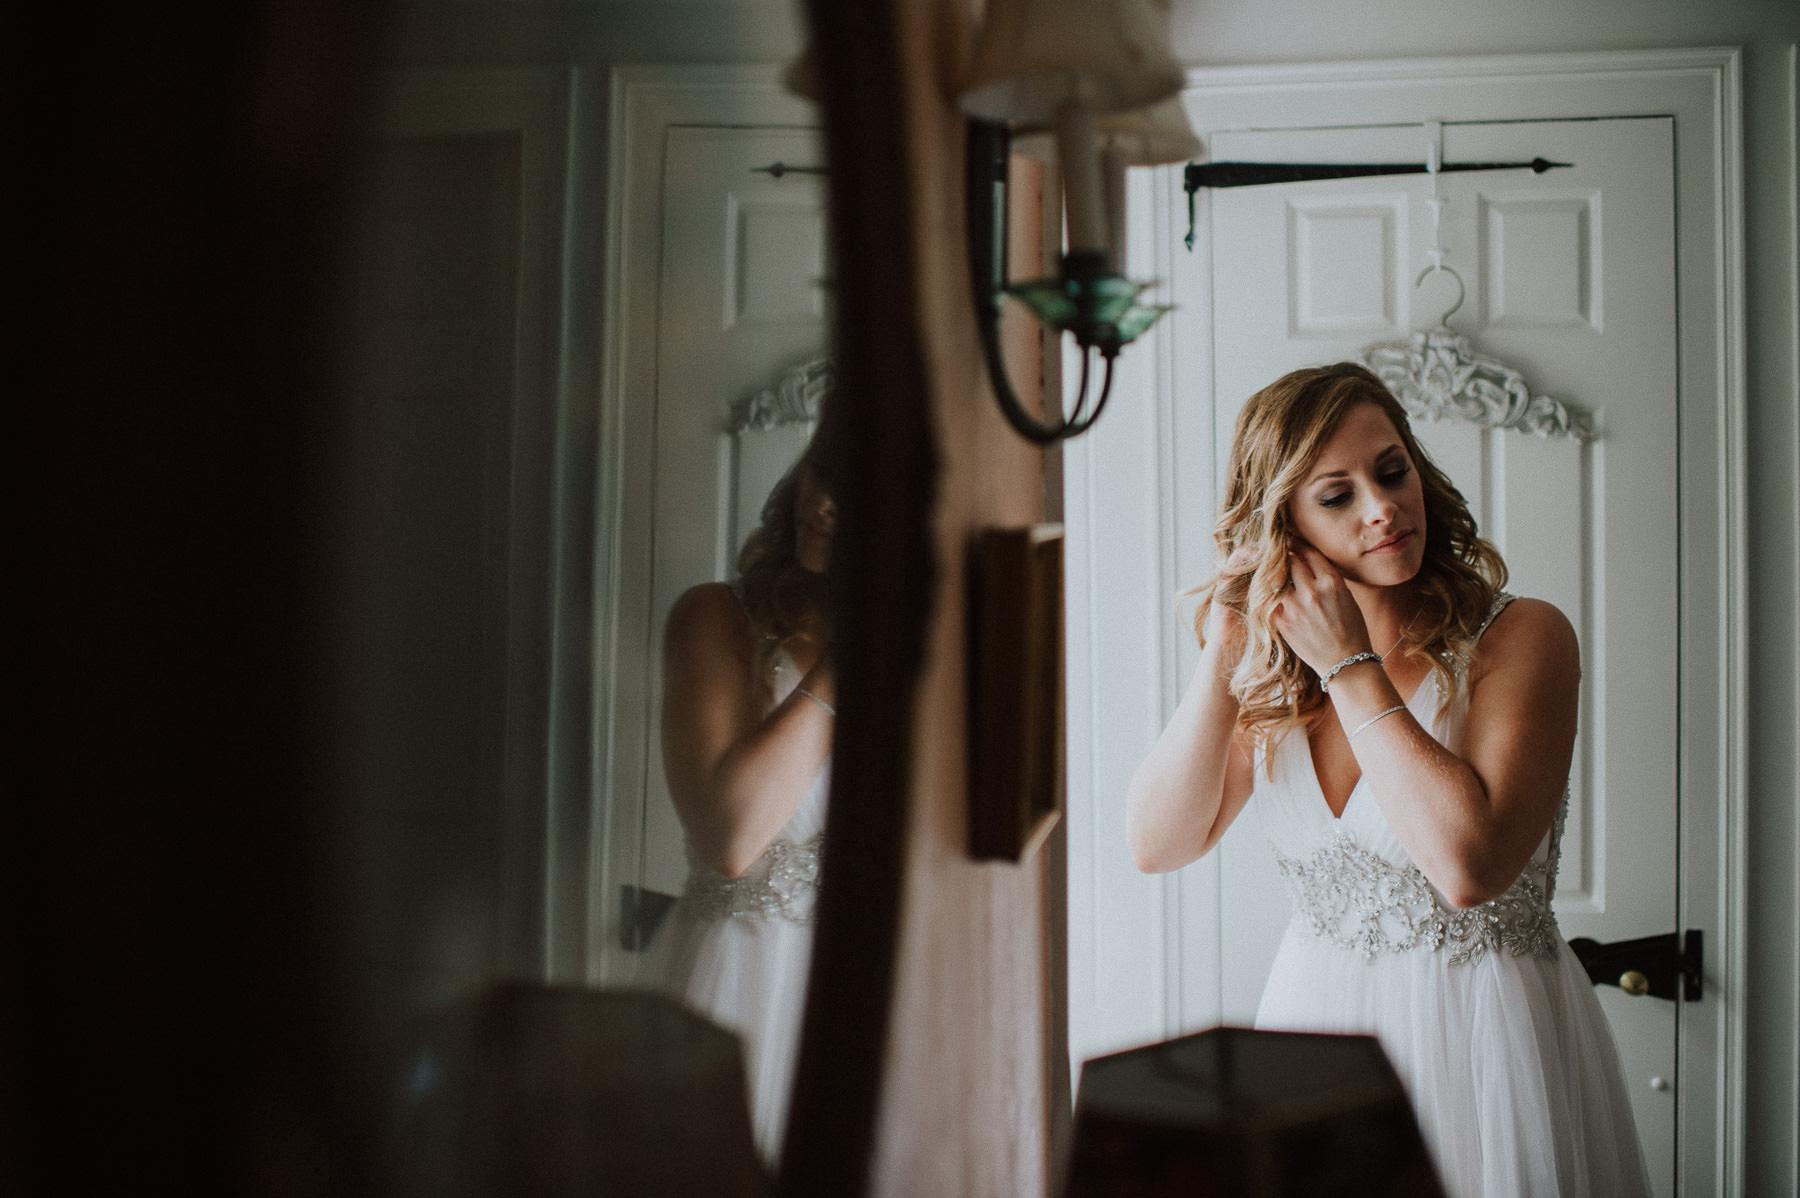 appleford-estate-wedding-photography-20.jpg